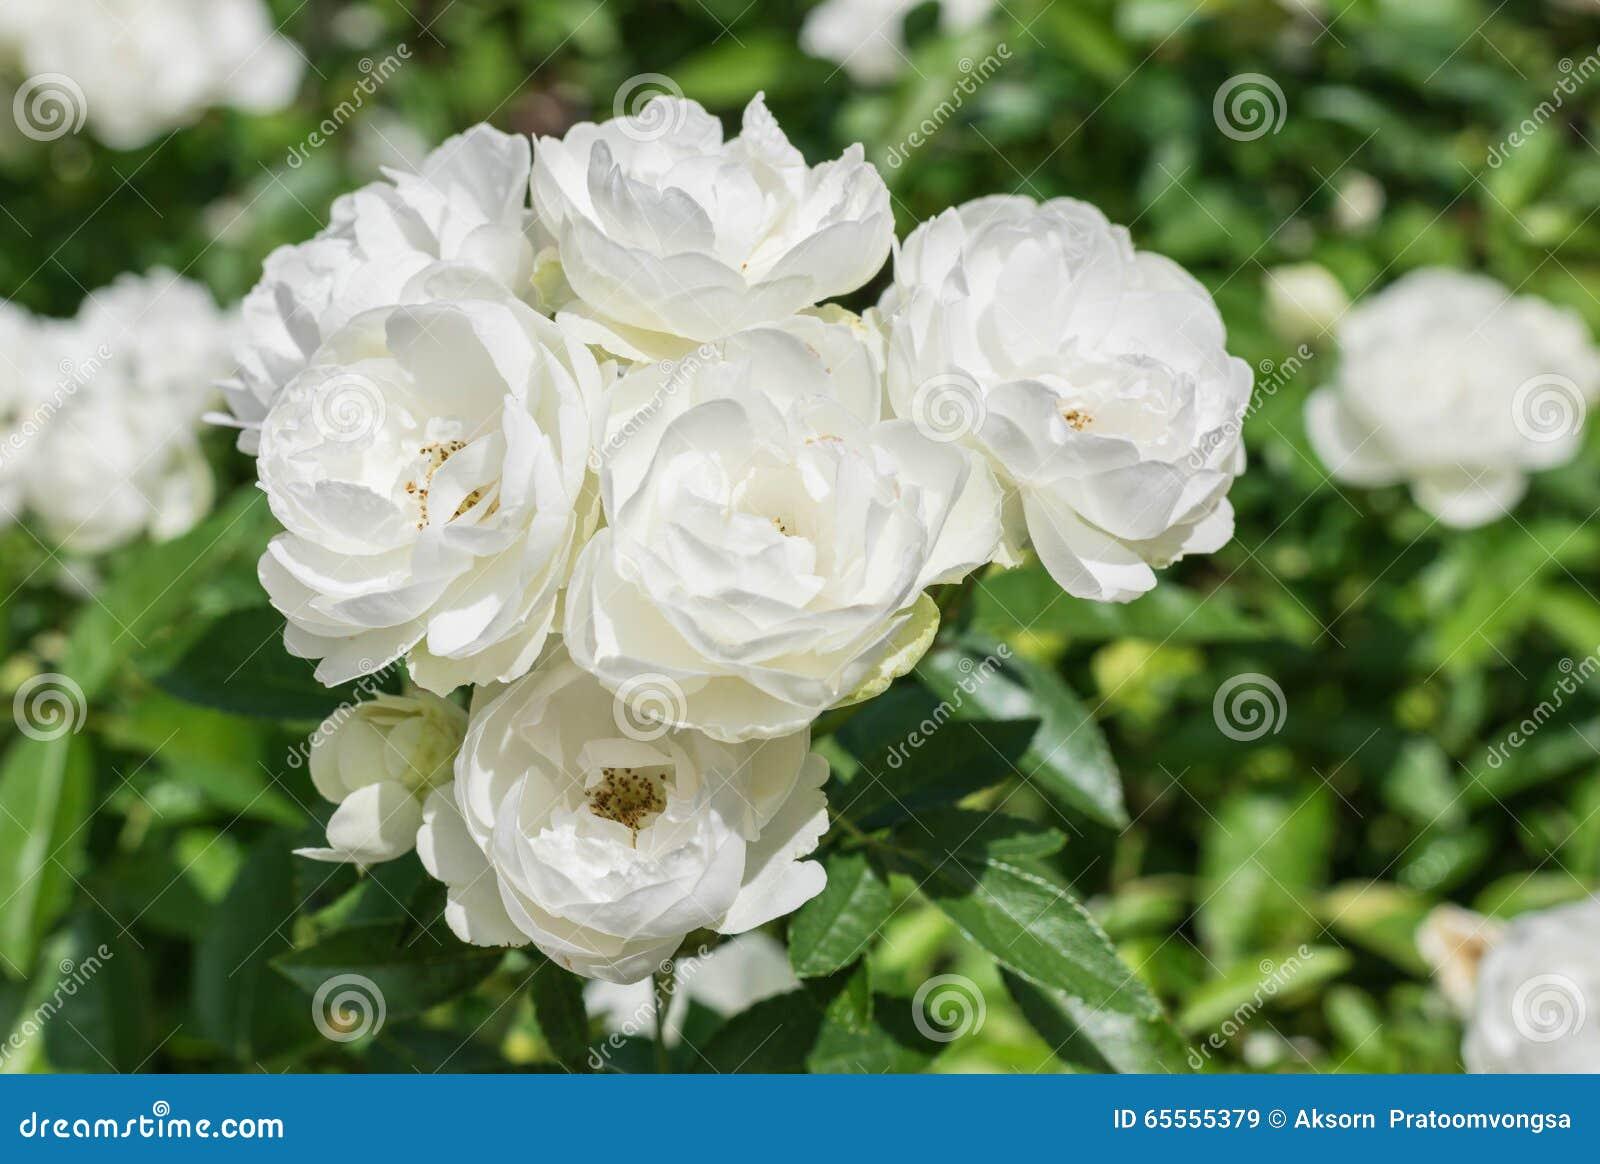 Natural White Rose Flower Stock Image Image Of Fresh 65555379